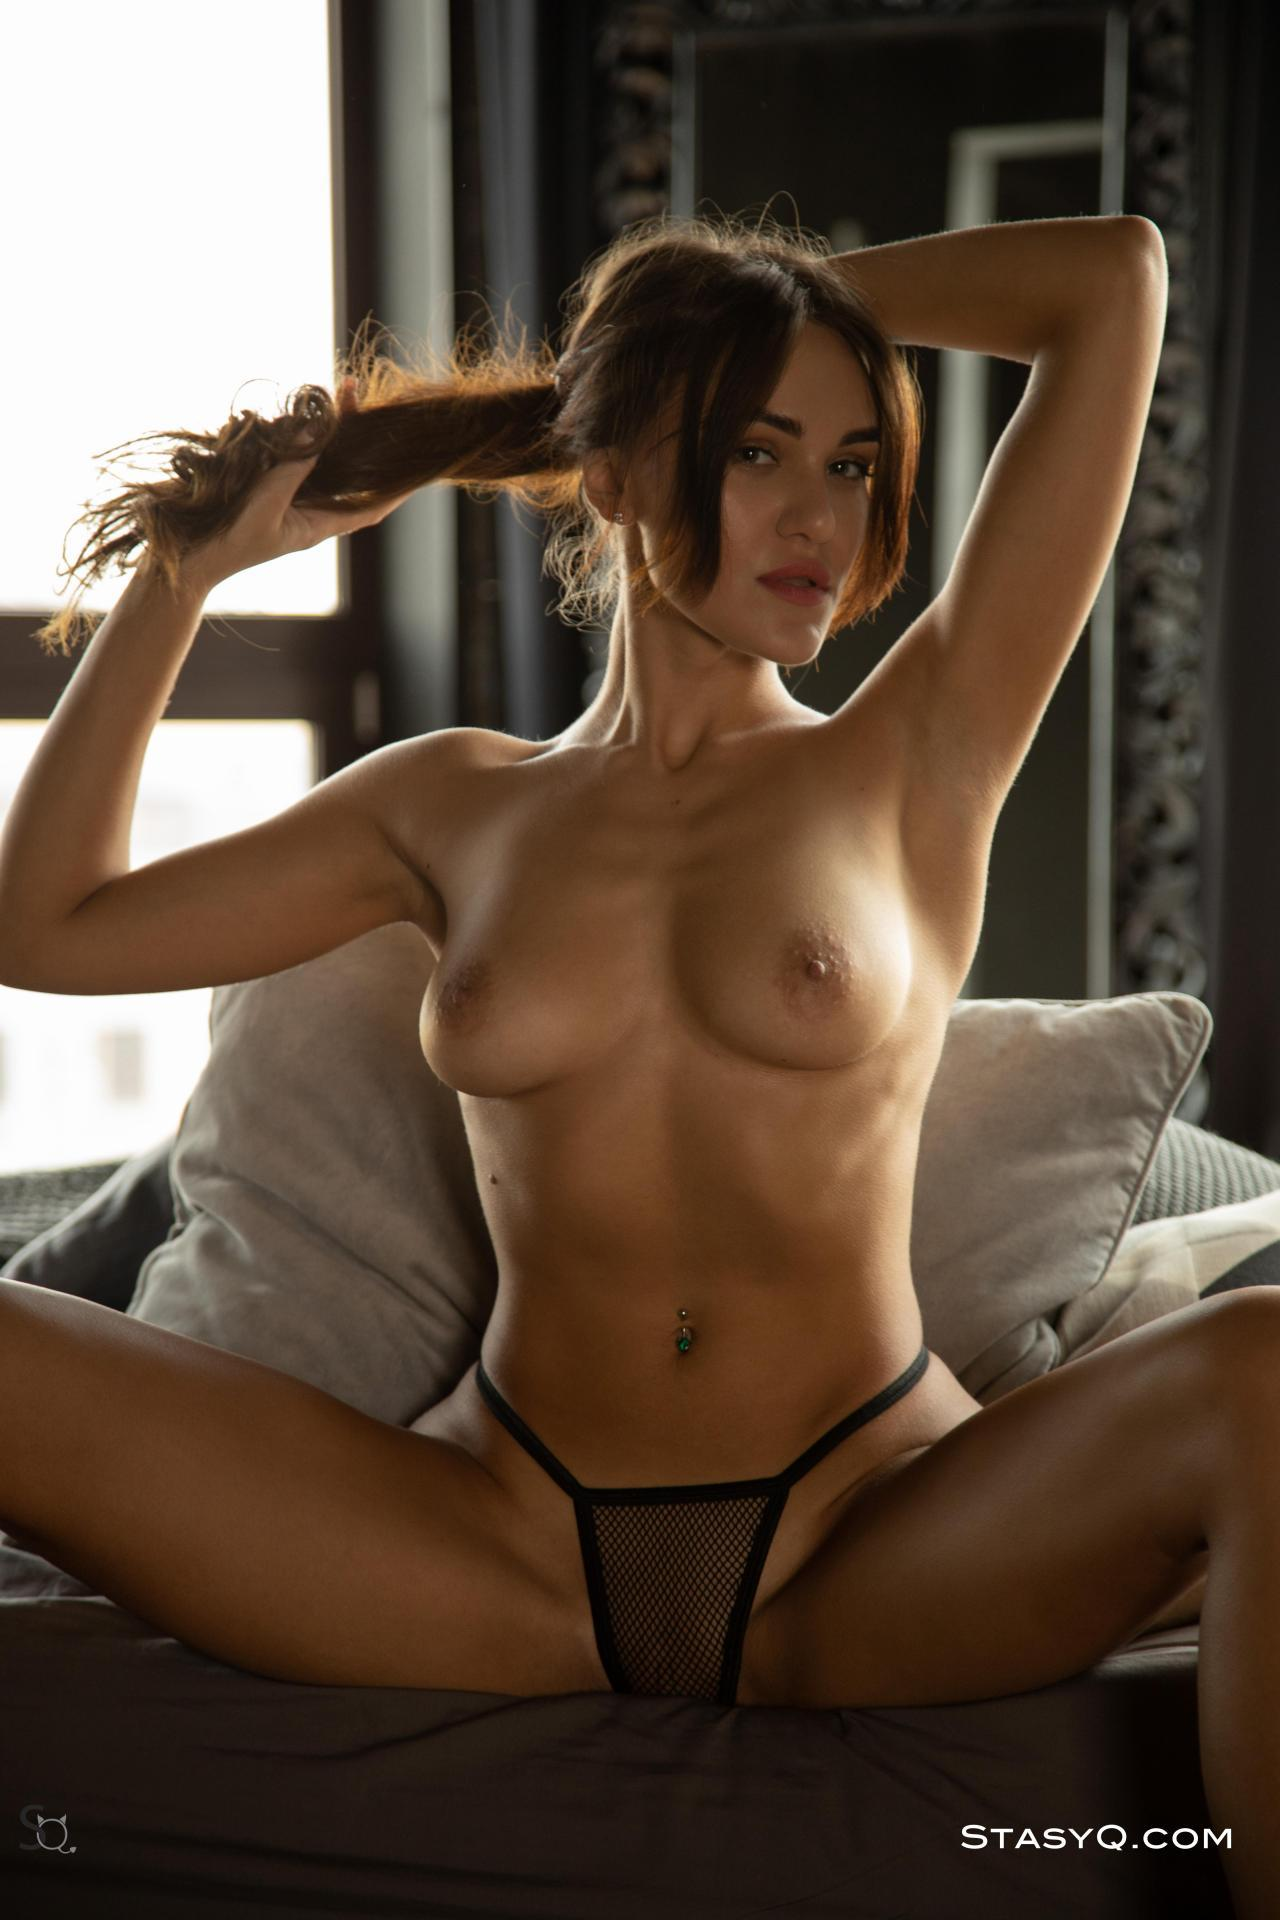 Stasyq Nude